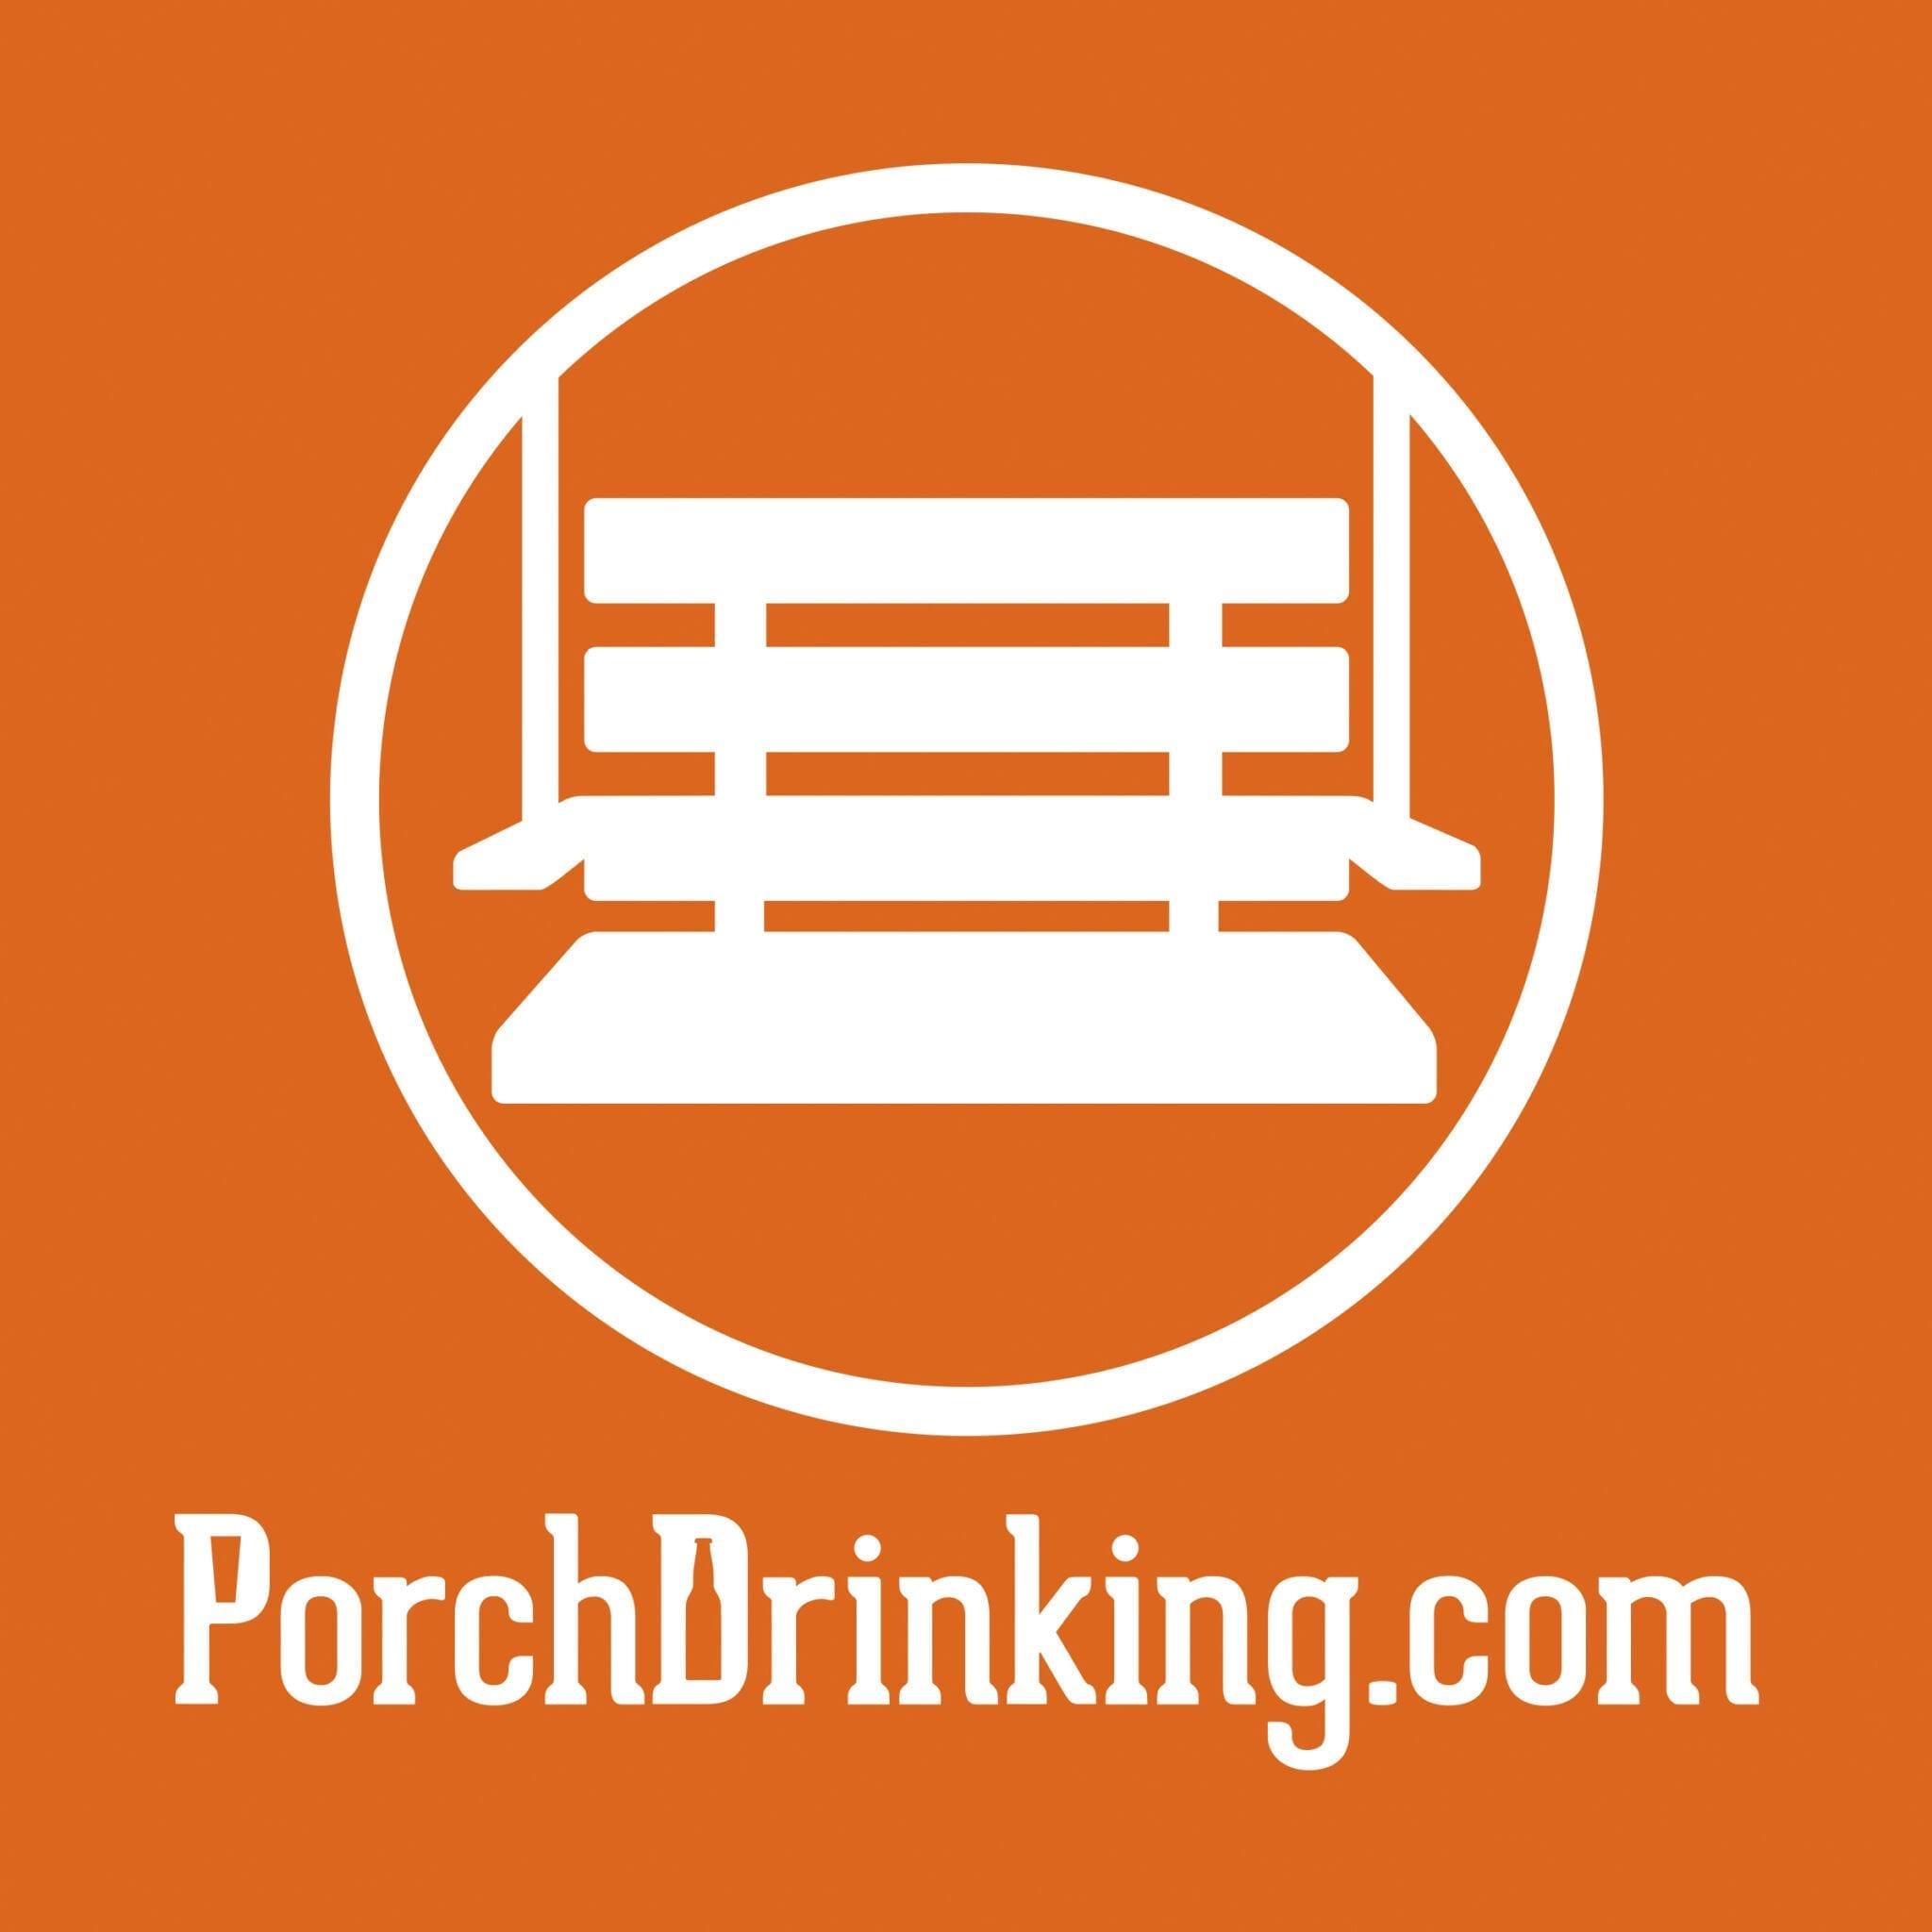 PorchDrinking.com